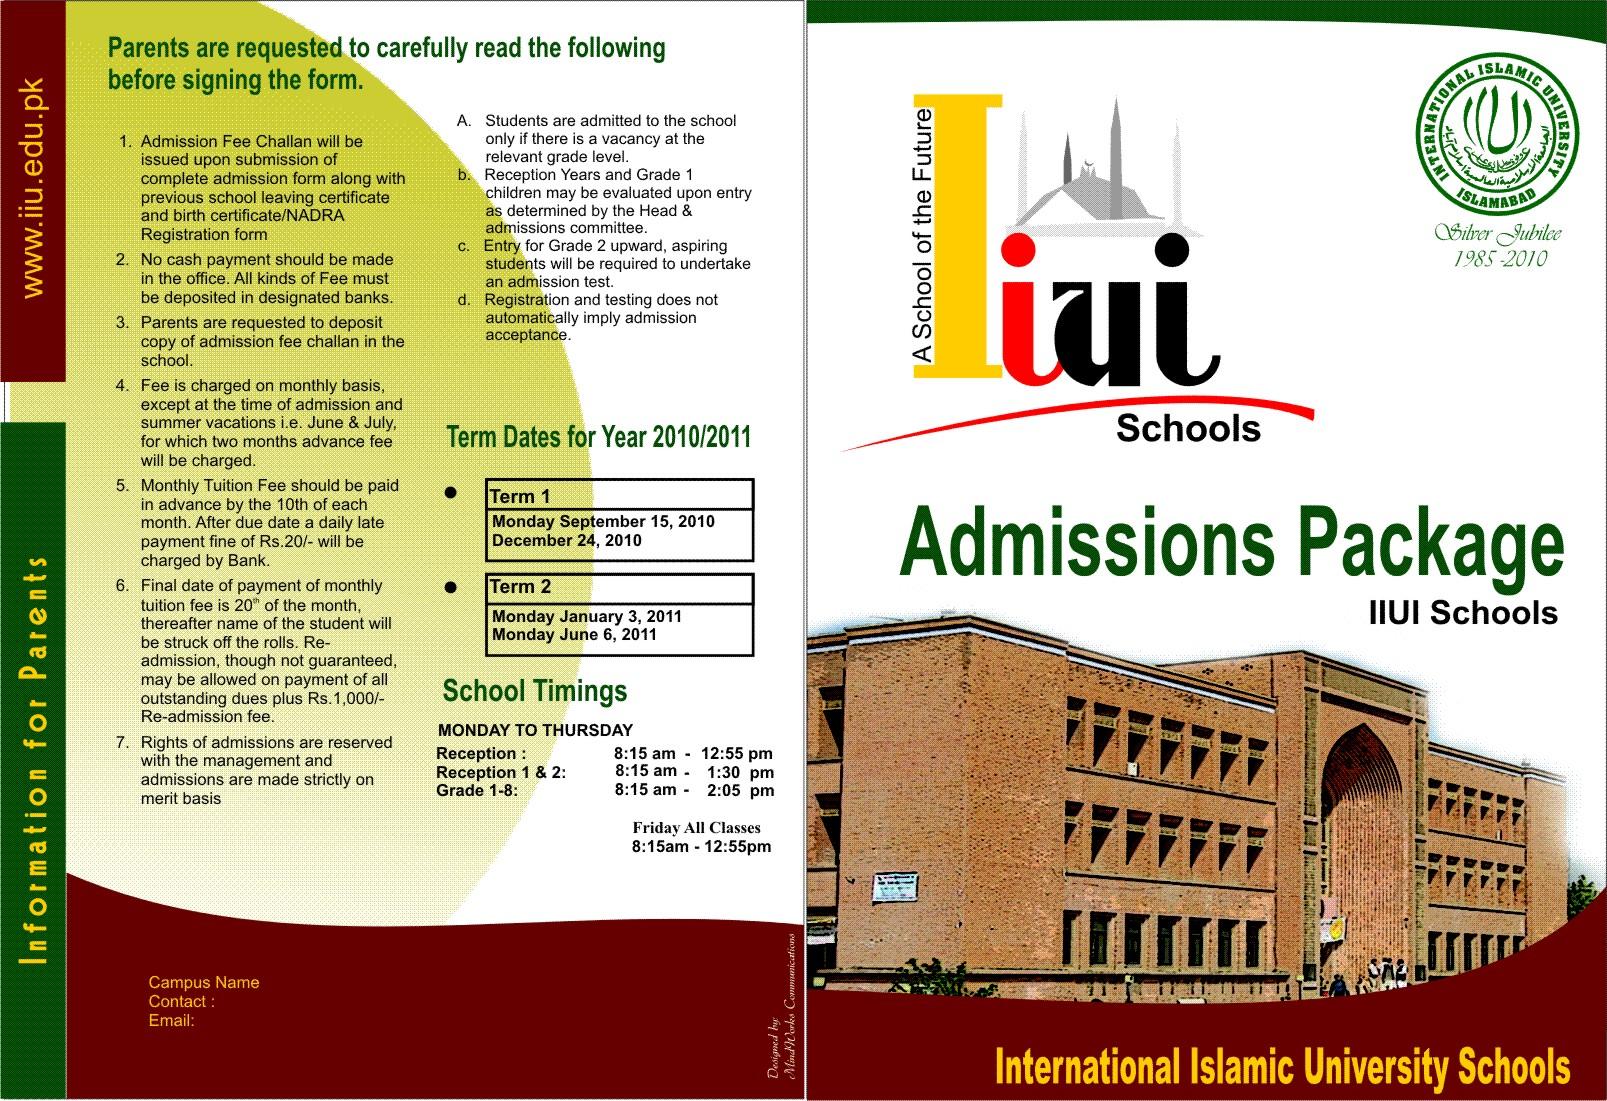 IIUI Schools brochure | International Islamic University